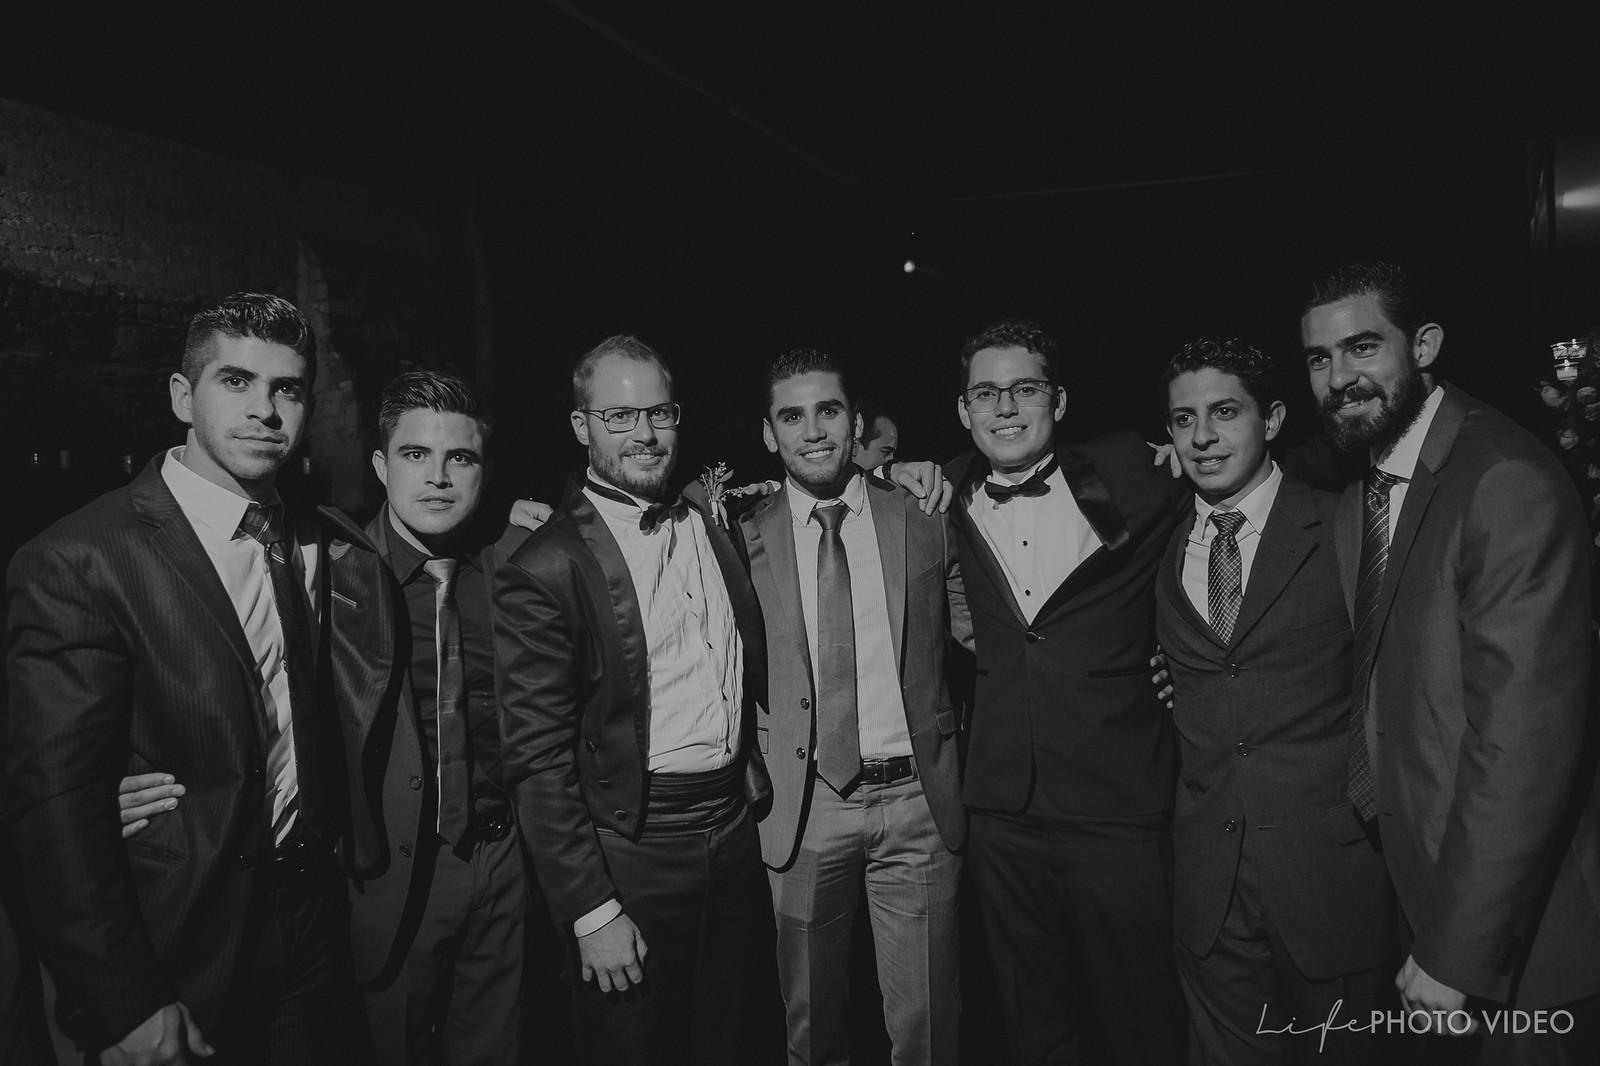 LifePhotoVideo_Boda_Guanajuato_Wedding_0070